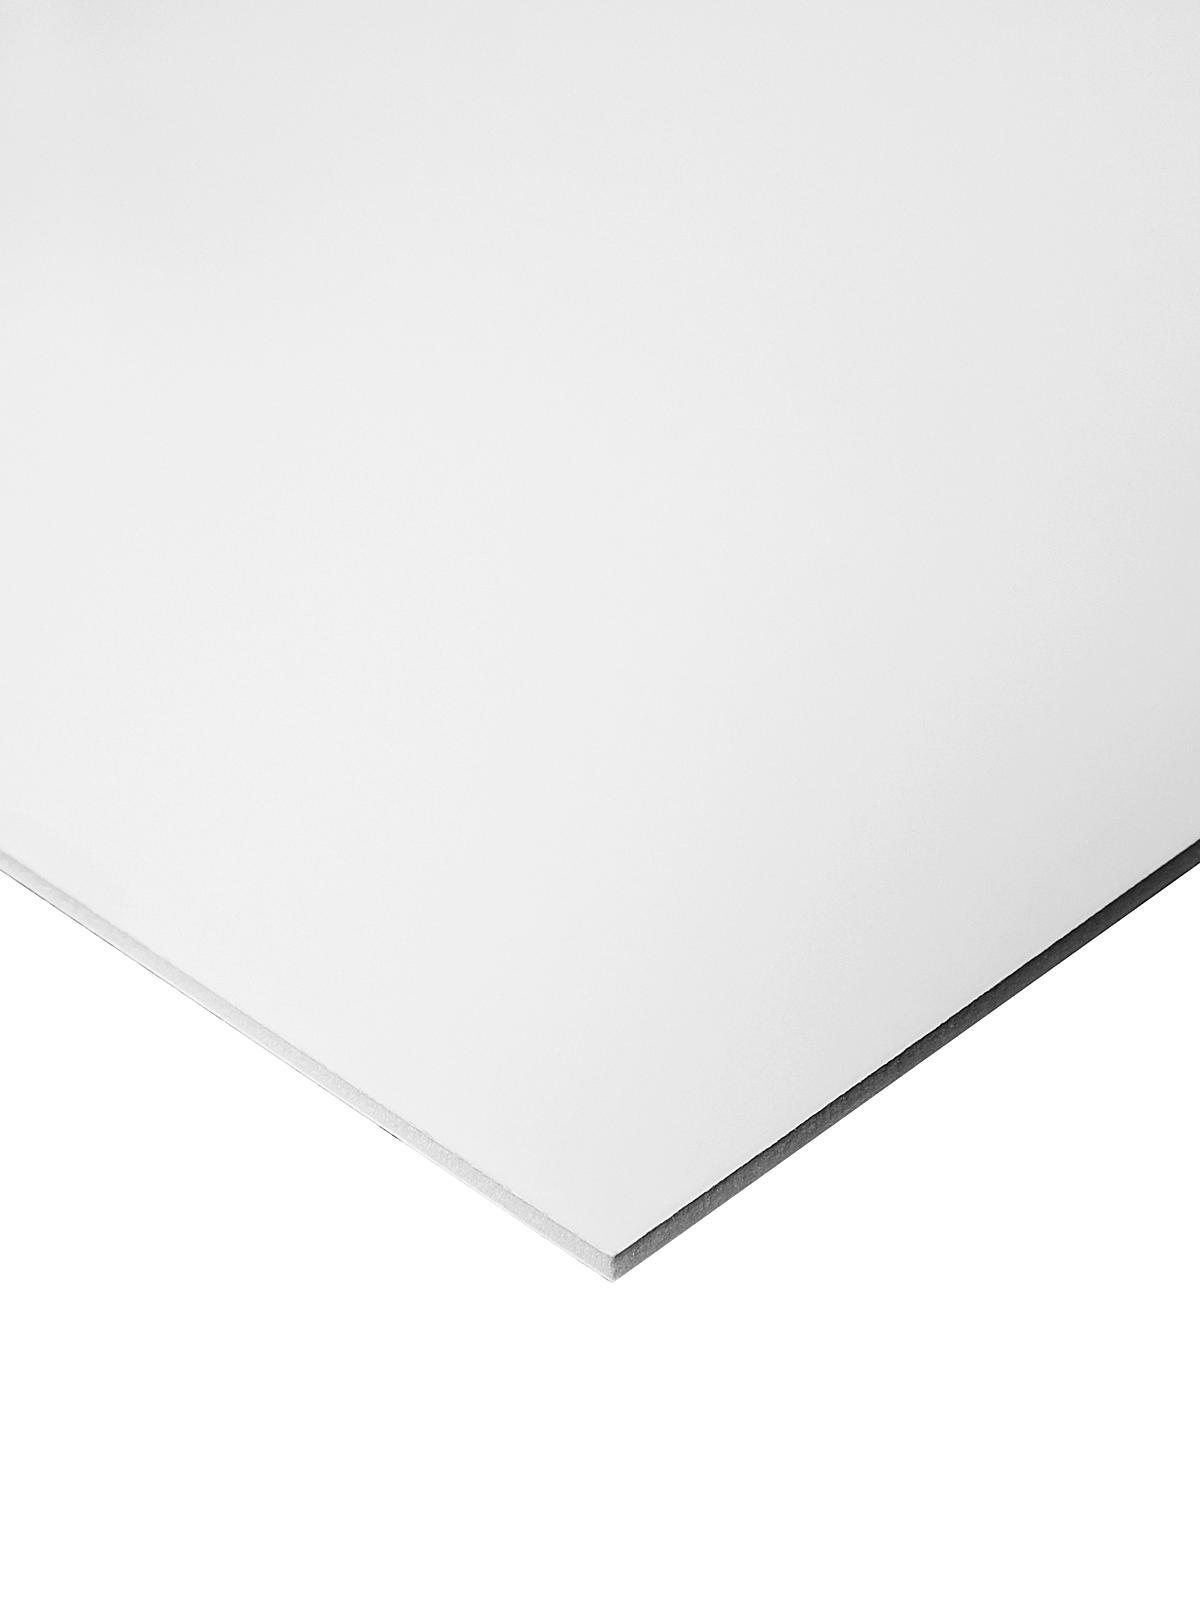 Fome-cor Board White 3 16 In. X 30 In. X 40 In. Each